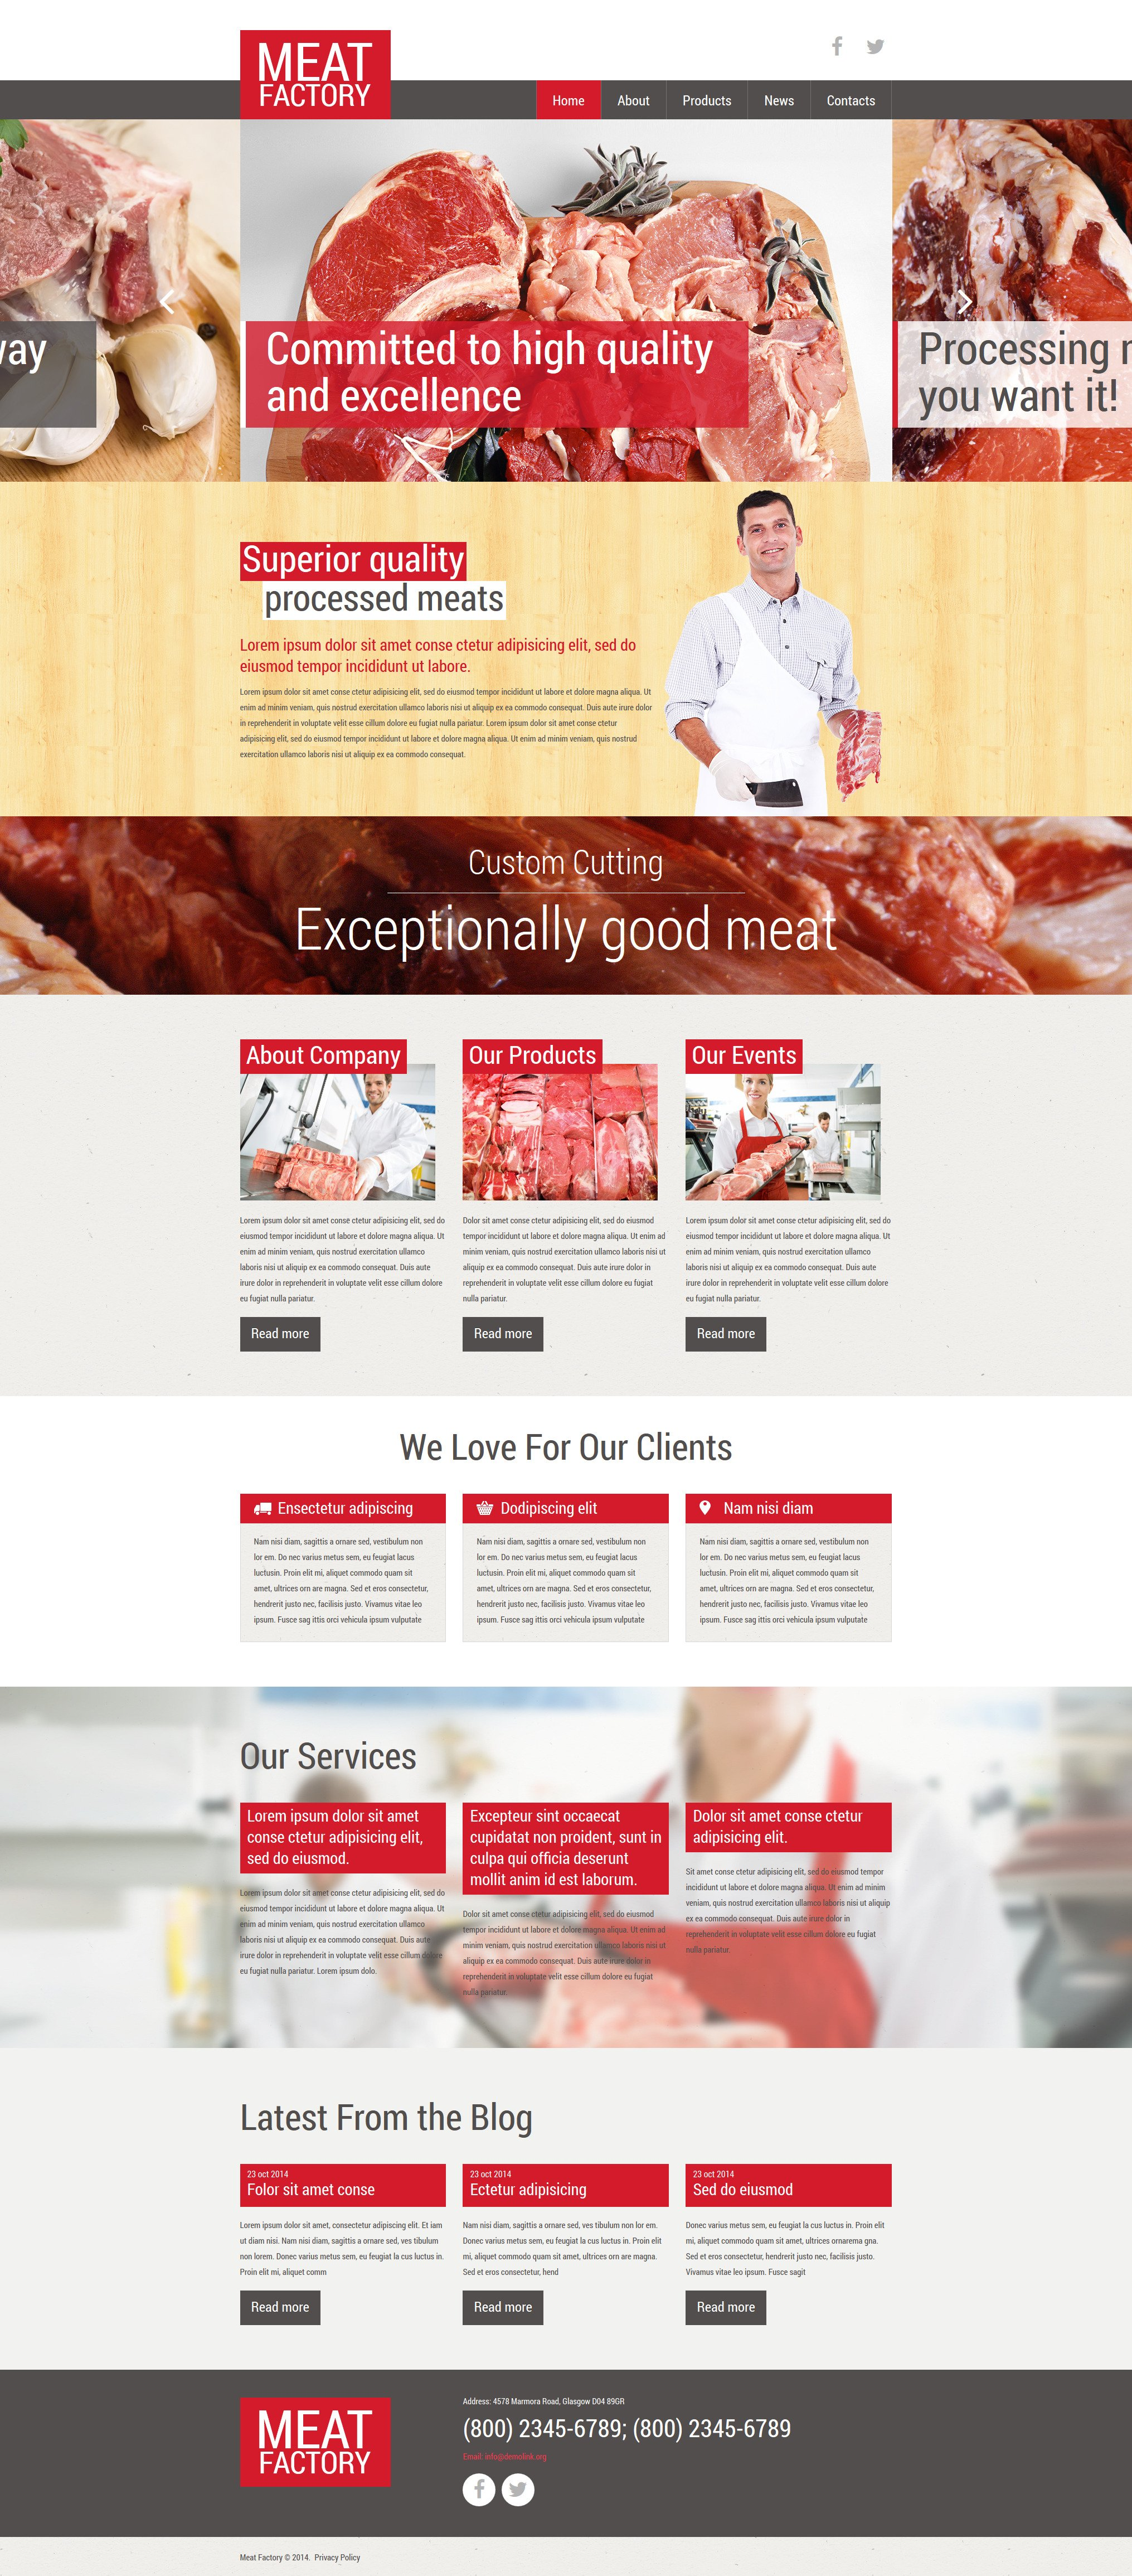 Healthy meat factory joomla template 51977 healthy meat factory joomla template toneelgroepblik Gallery